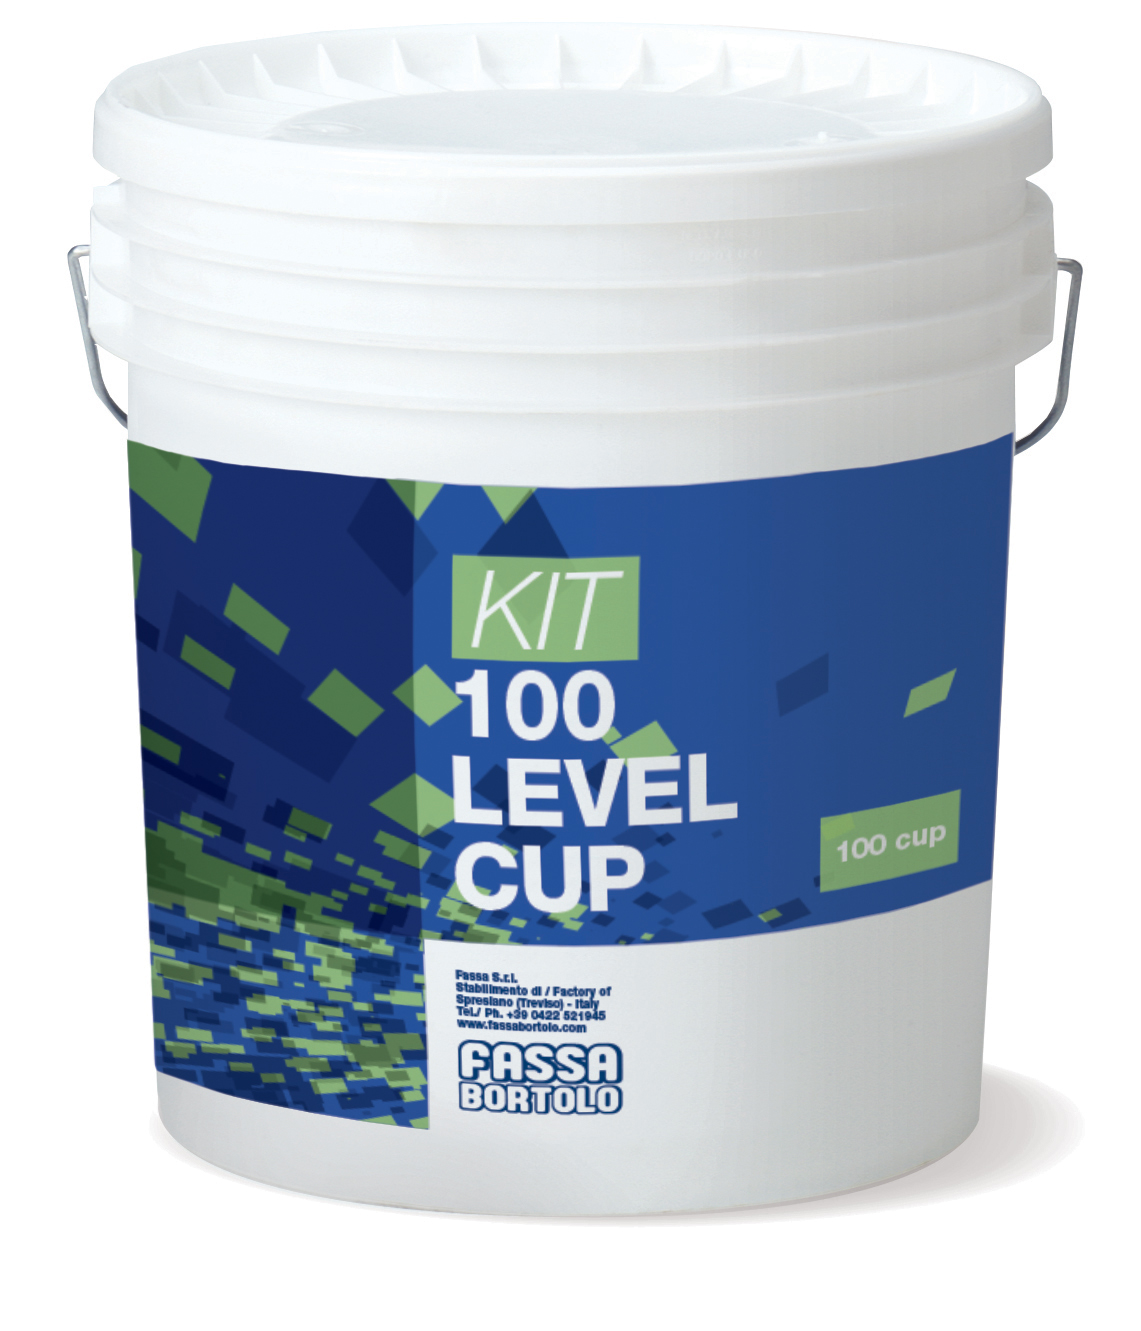 KIT 100 LEVEL CUP: Kit composto da 100 ricambi Cup